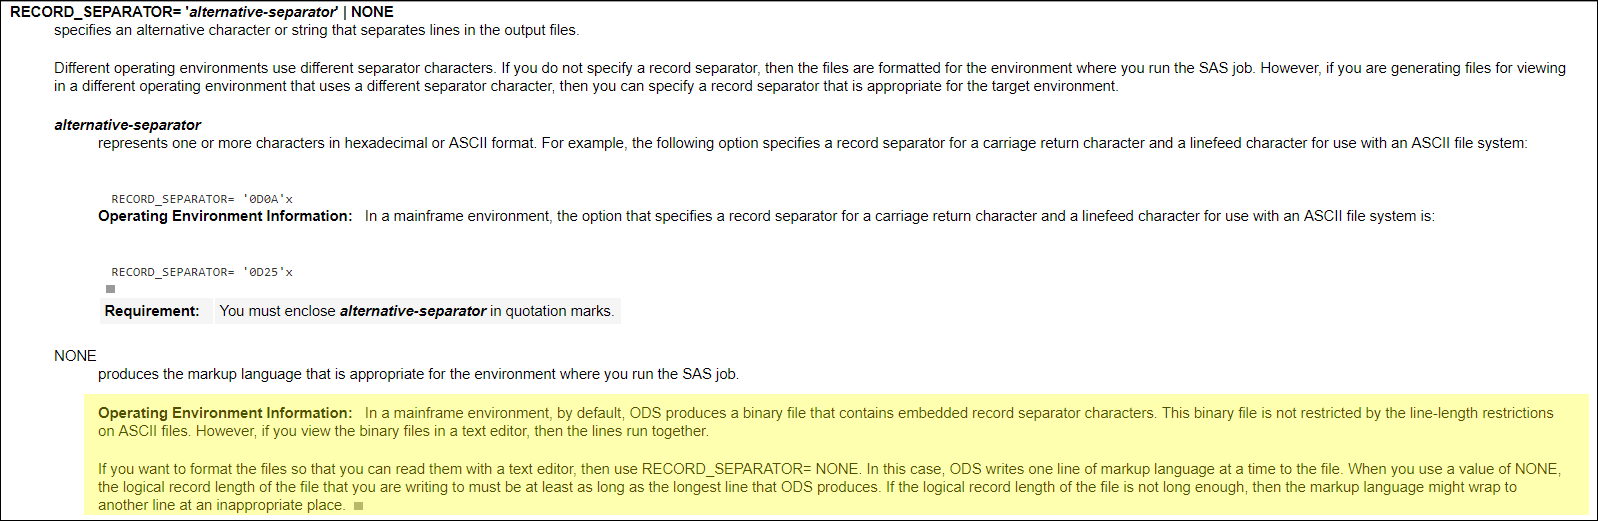 sas mainfrmae html readable format - SAS Support Communities